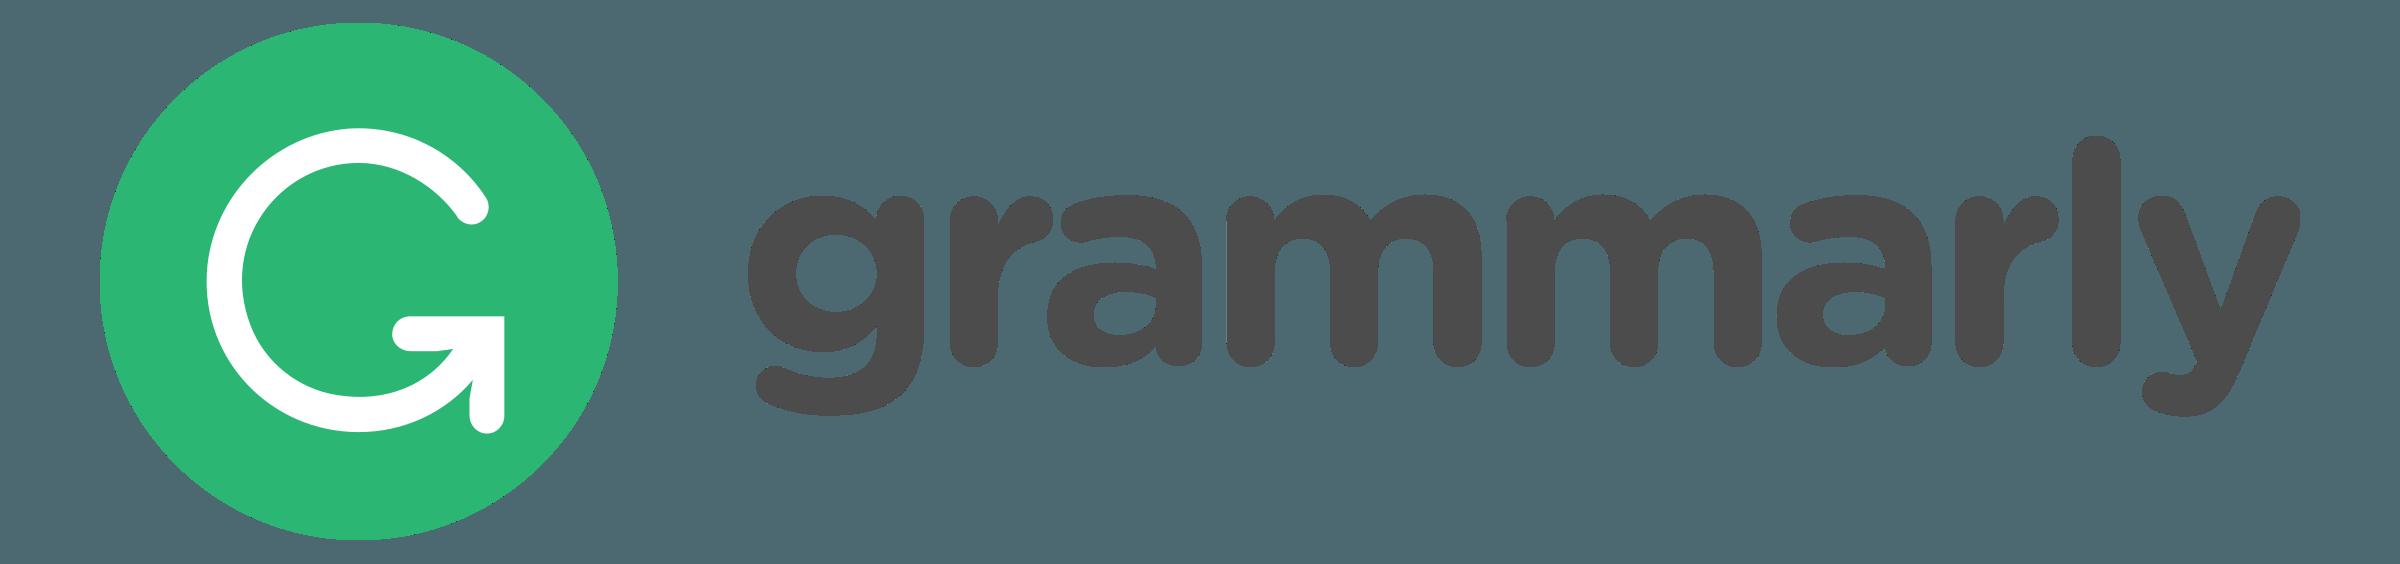 Grammarly Logo PNG Transparent & SVG Vector - Freebie Supply